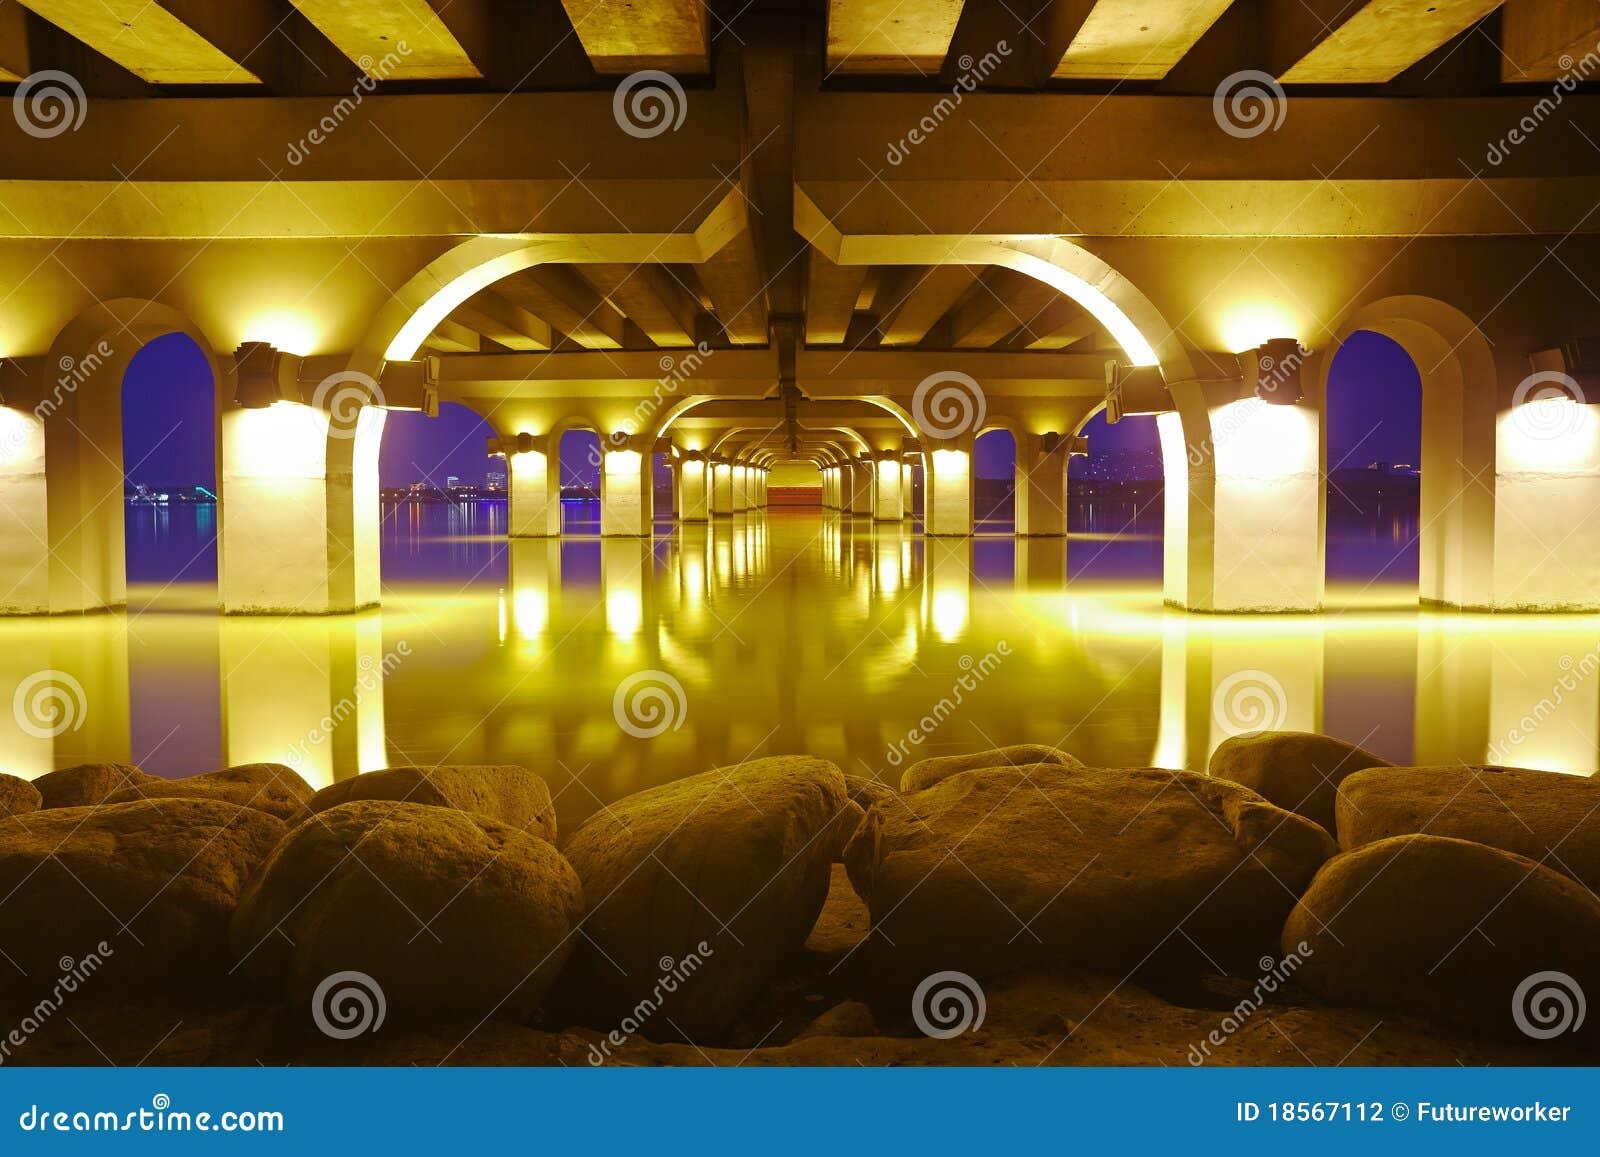 Night Scene Of Lihu Bridge Stock Photography - Image: 18567112: www.dreamstime.com/stock-photography-night-scene-lihu-bridge...